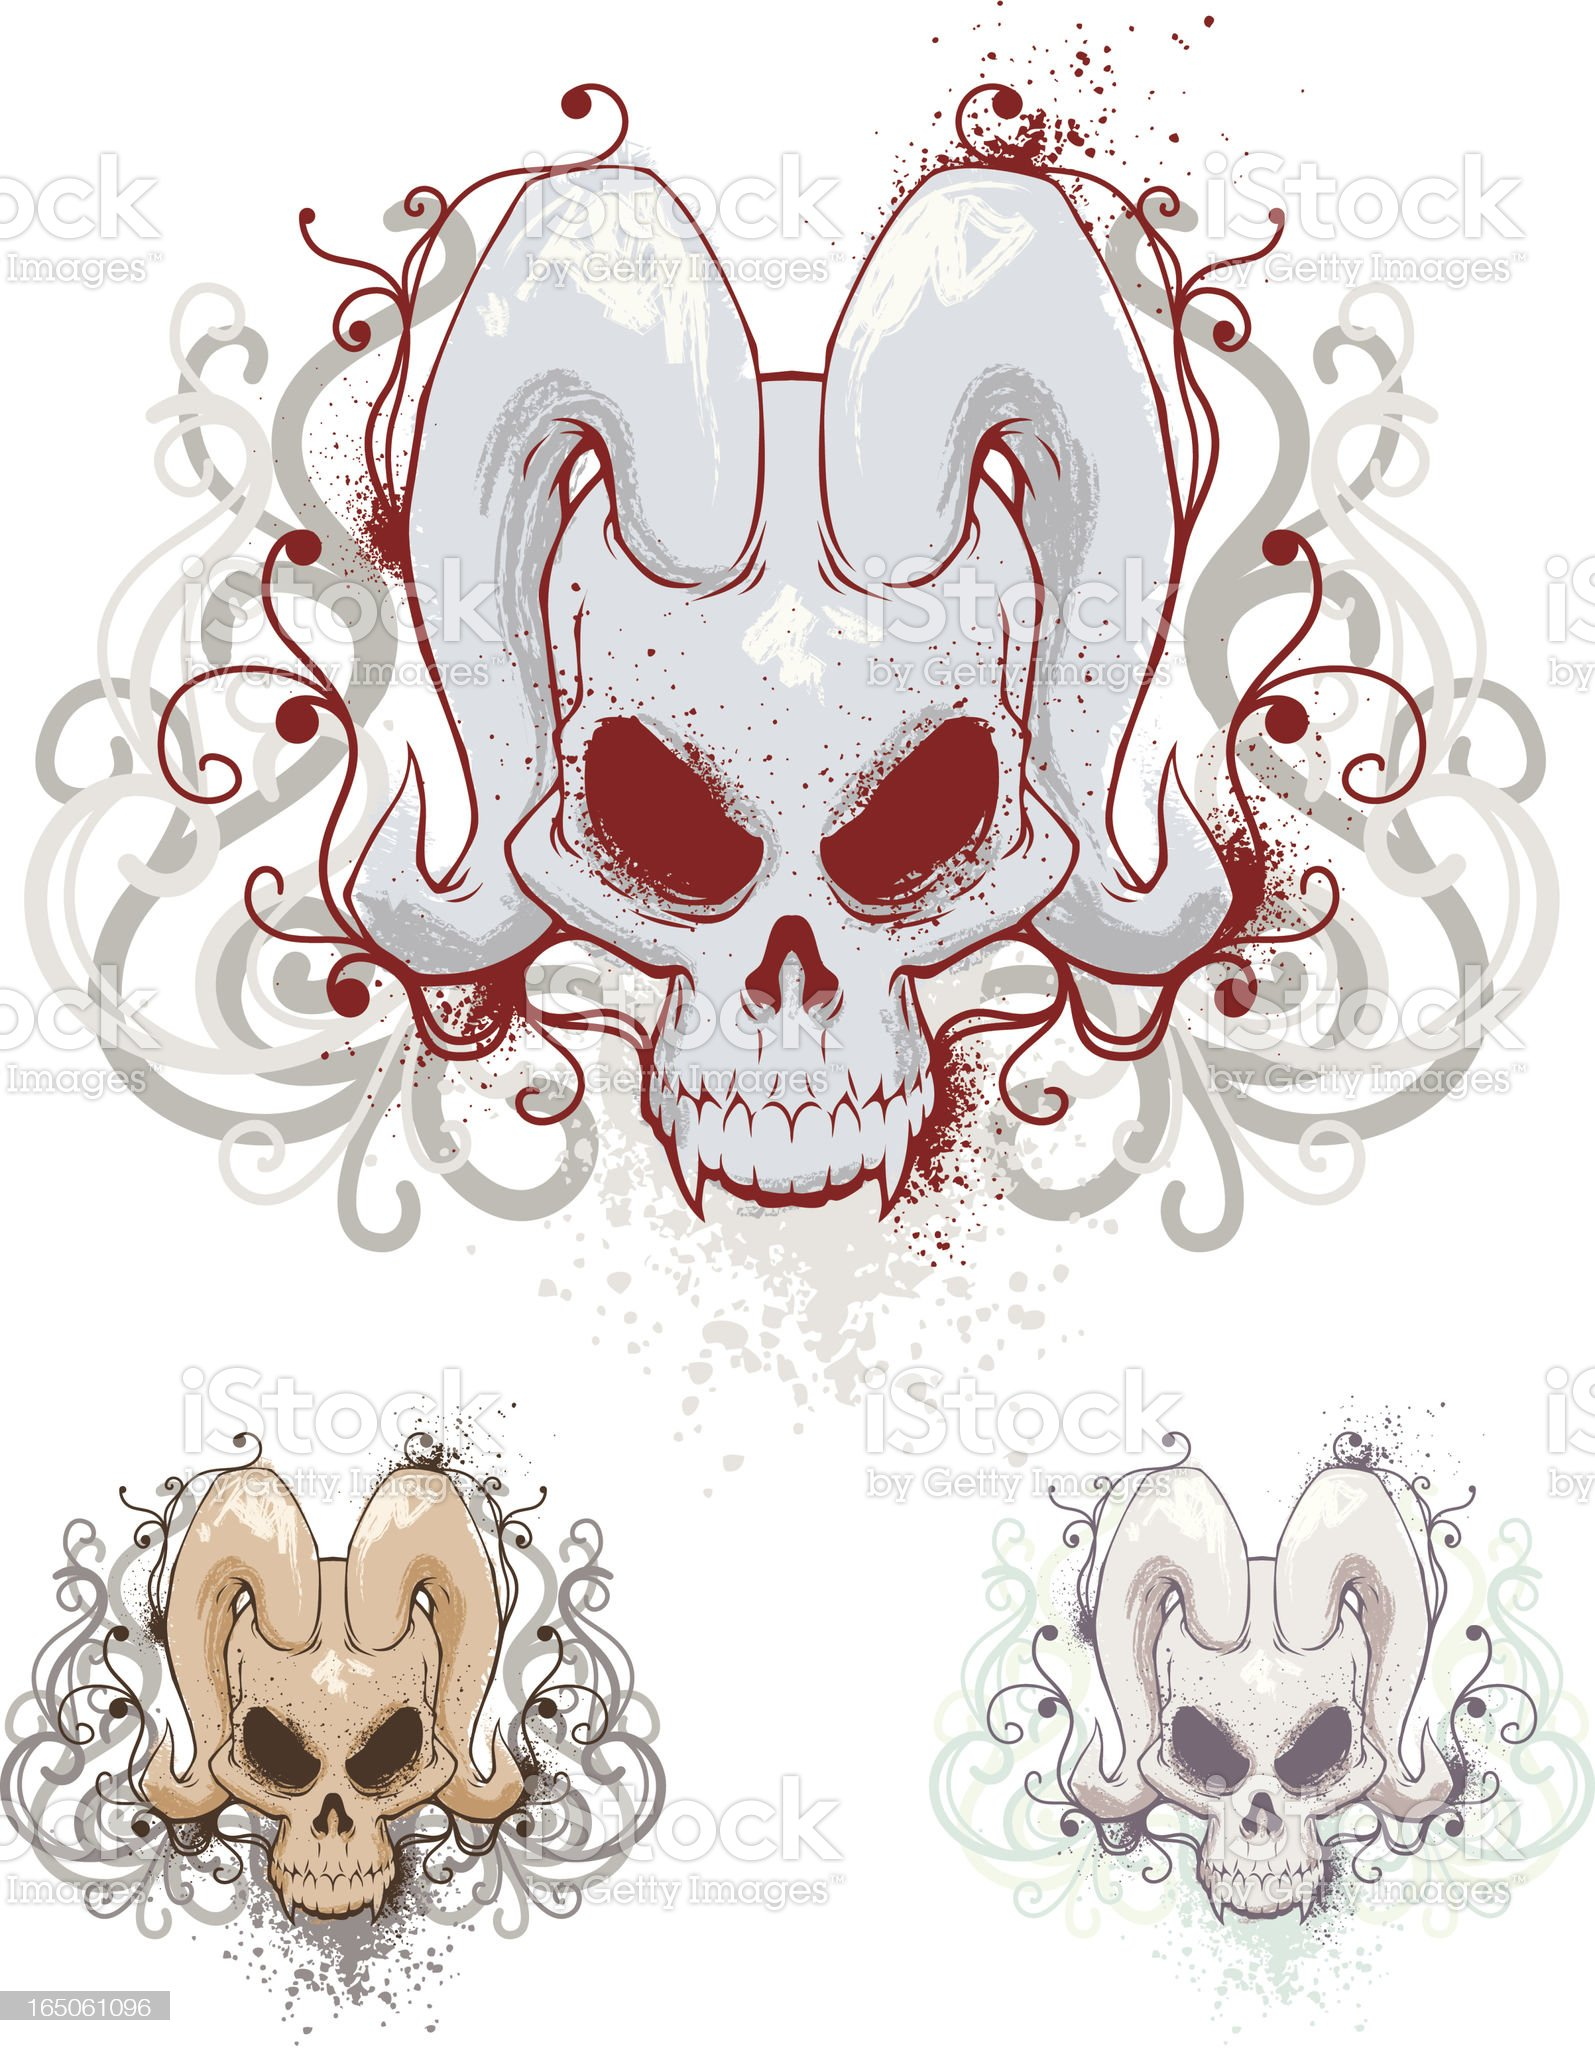 Demonic Skull royalty-free stock vector art